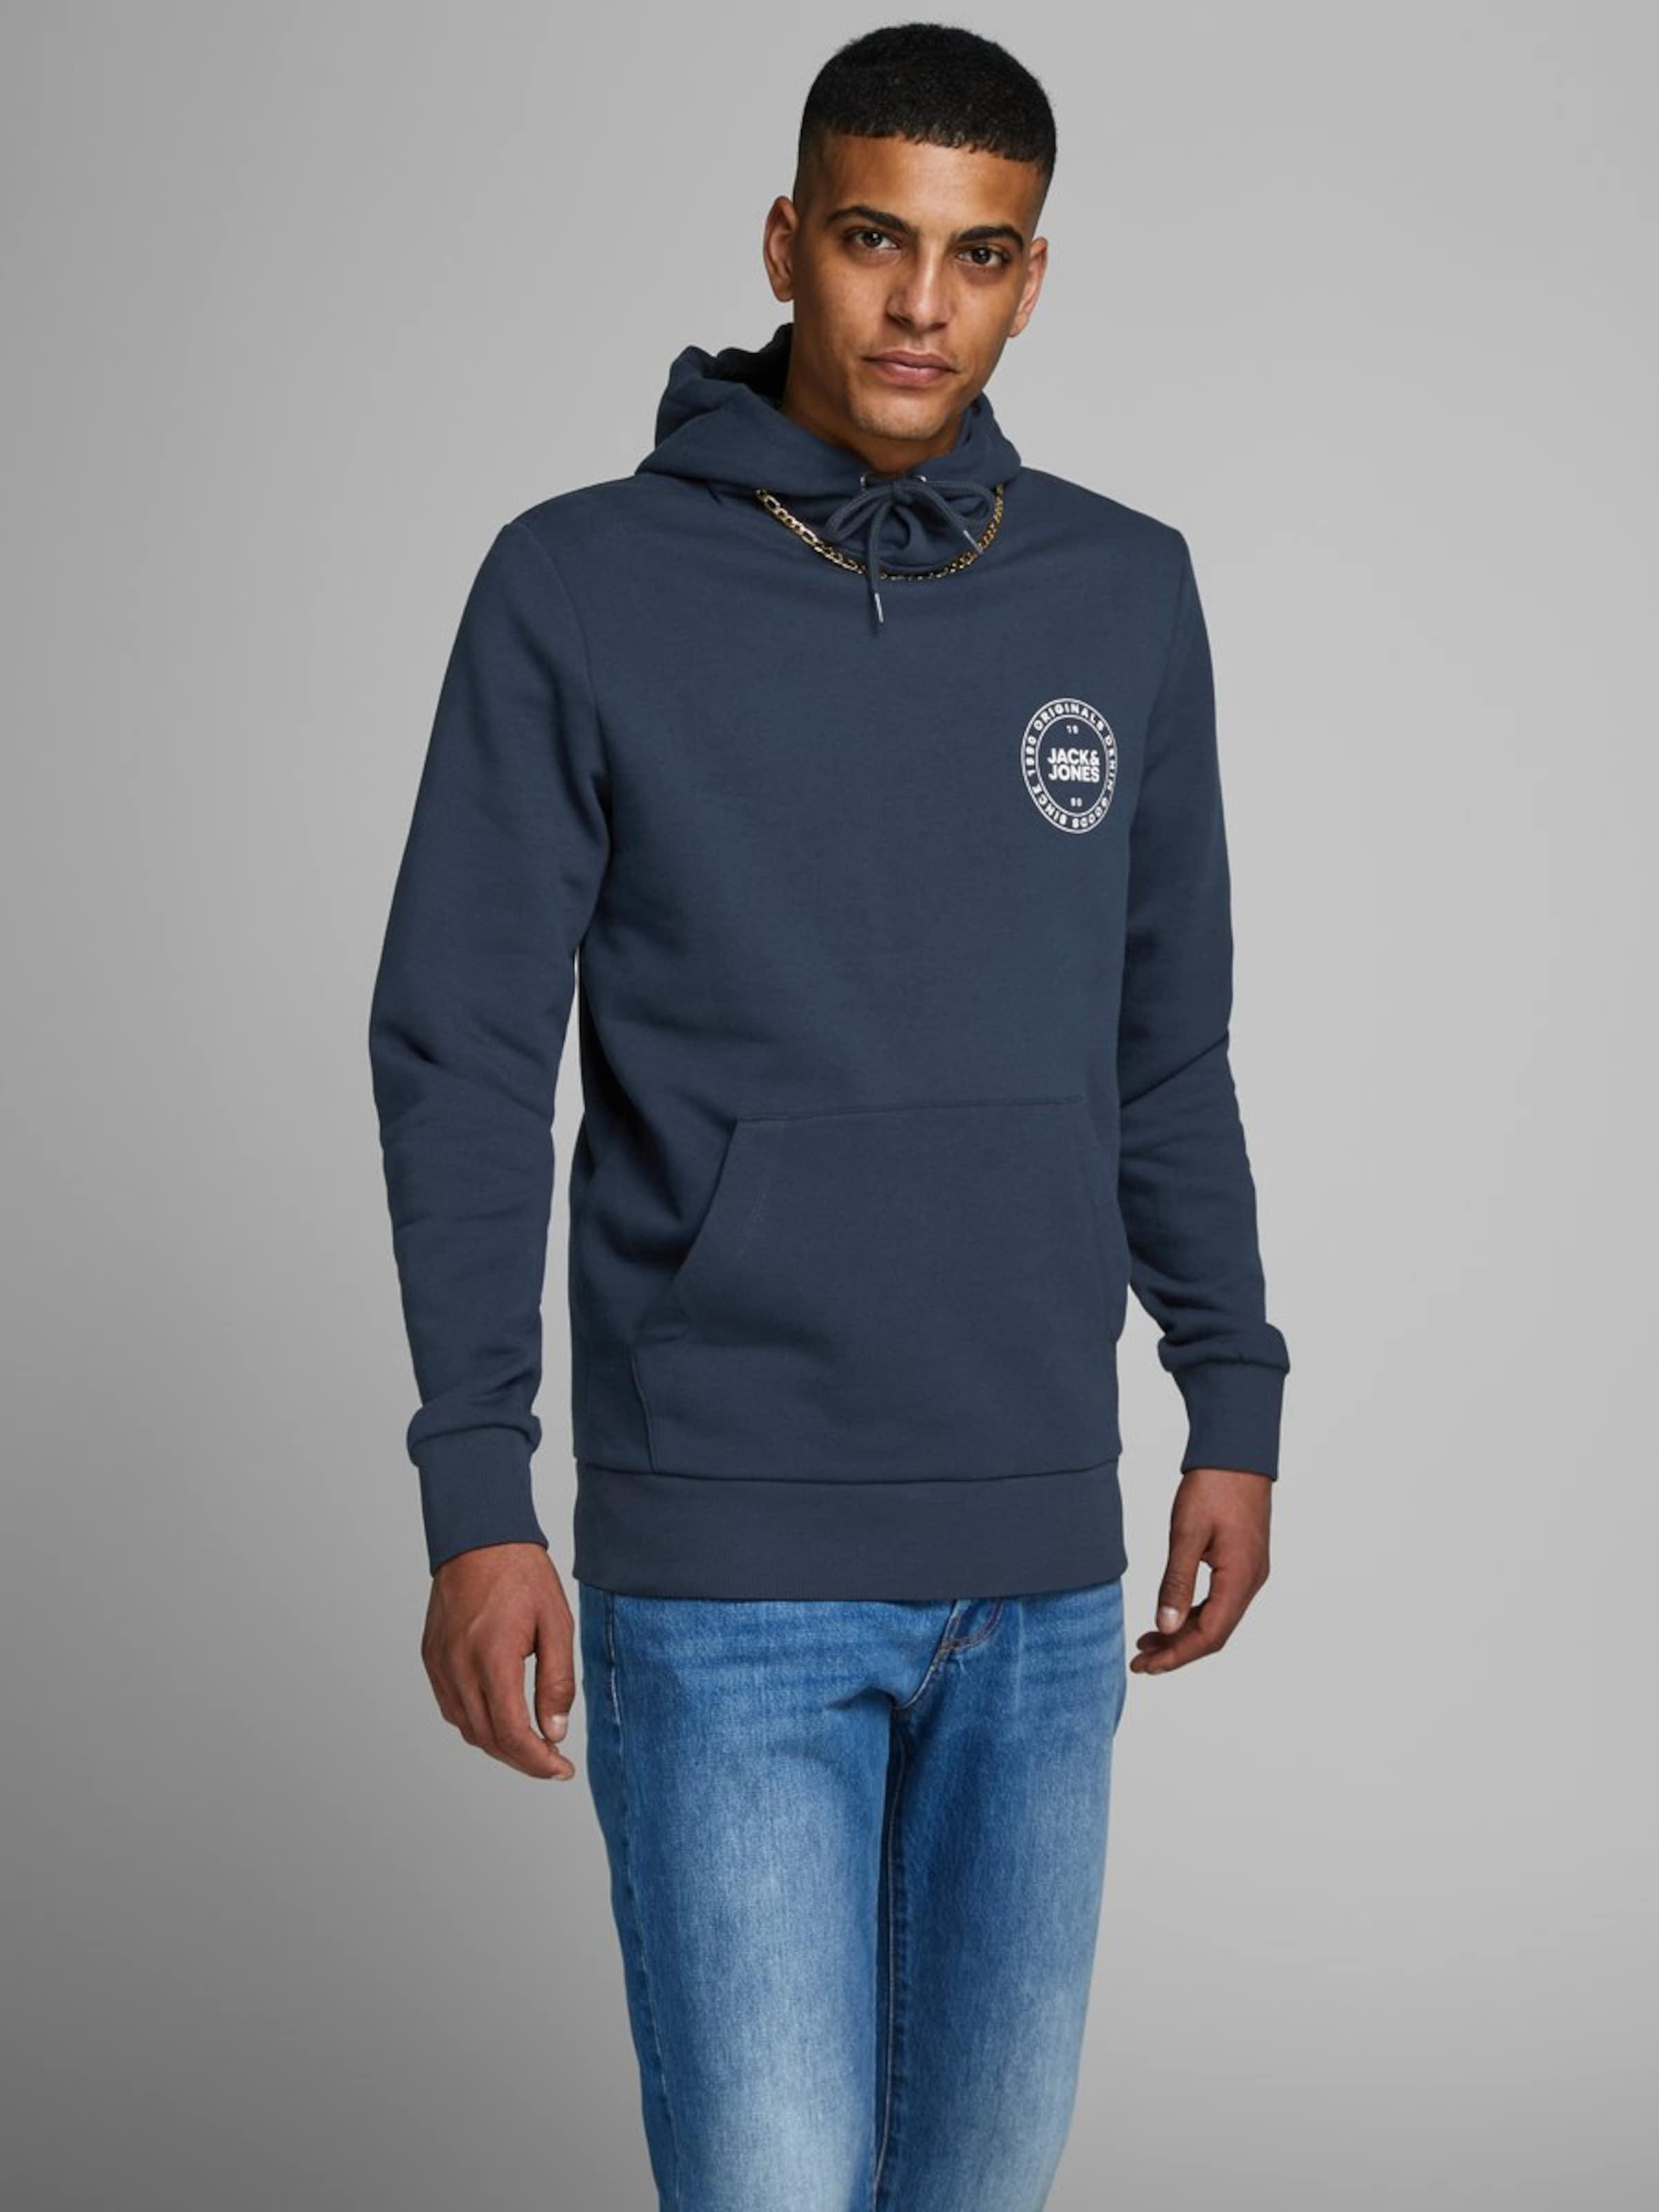 Sweatshirt Sweatshirt In In NavyWeiß Jackamp; Jackamp; Jones NavyWeiß Jones 3ARjqc45L